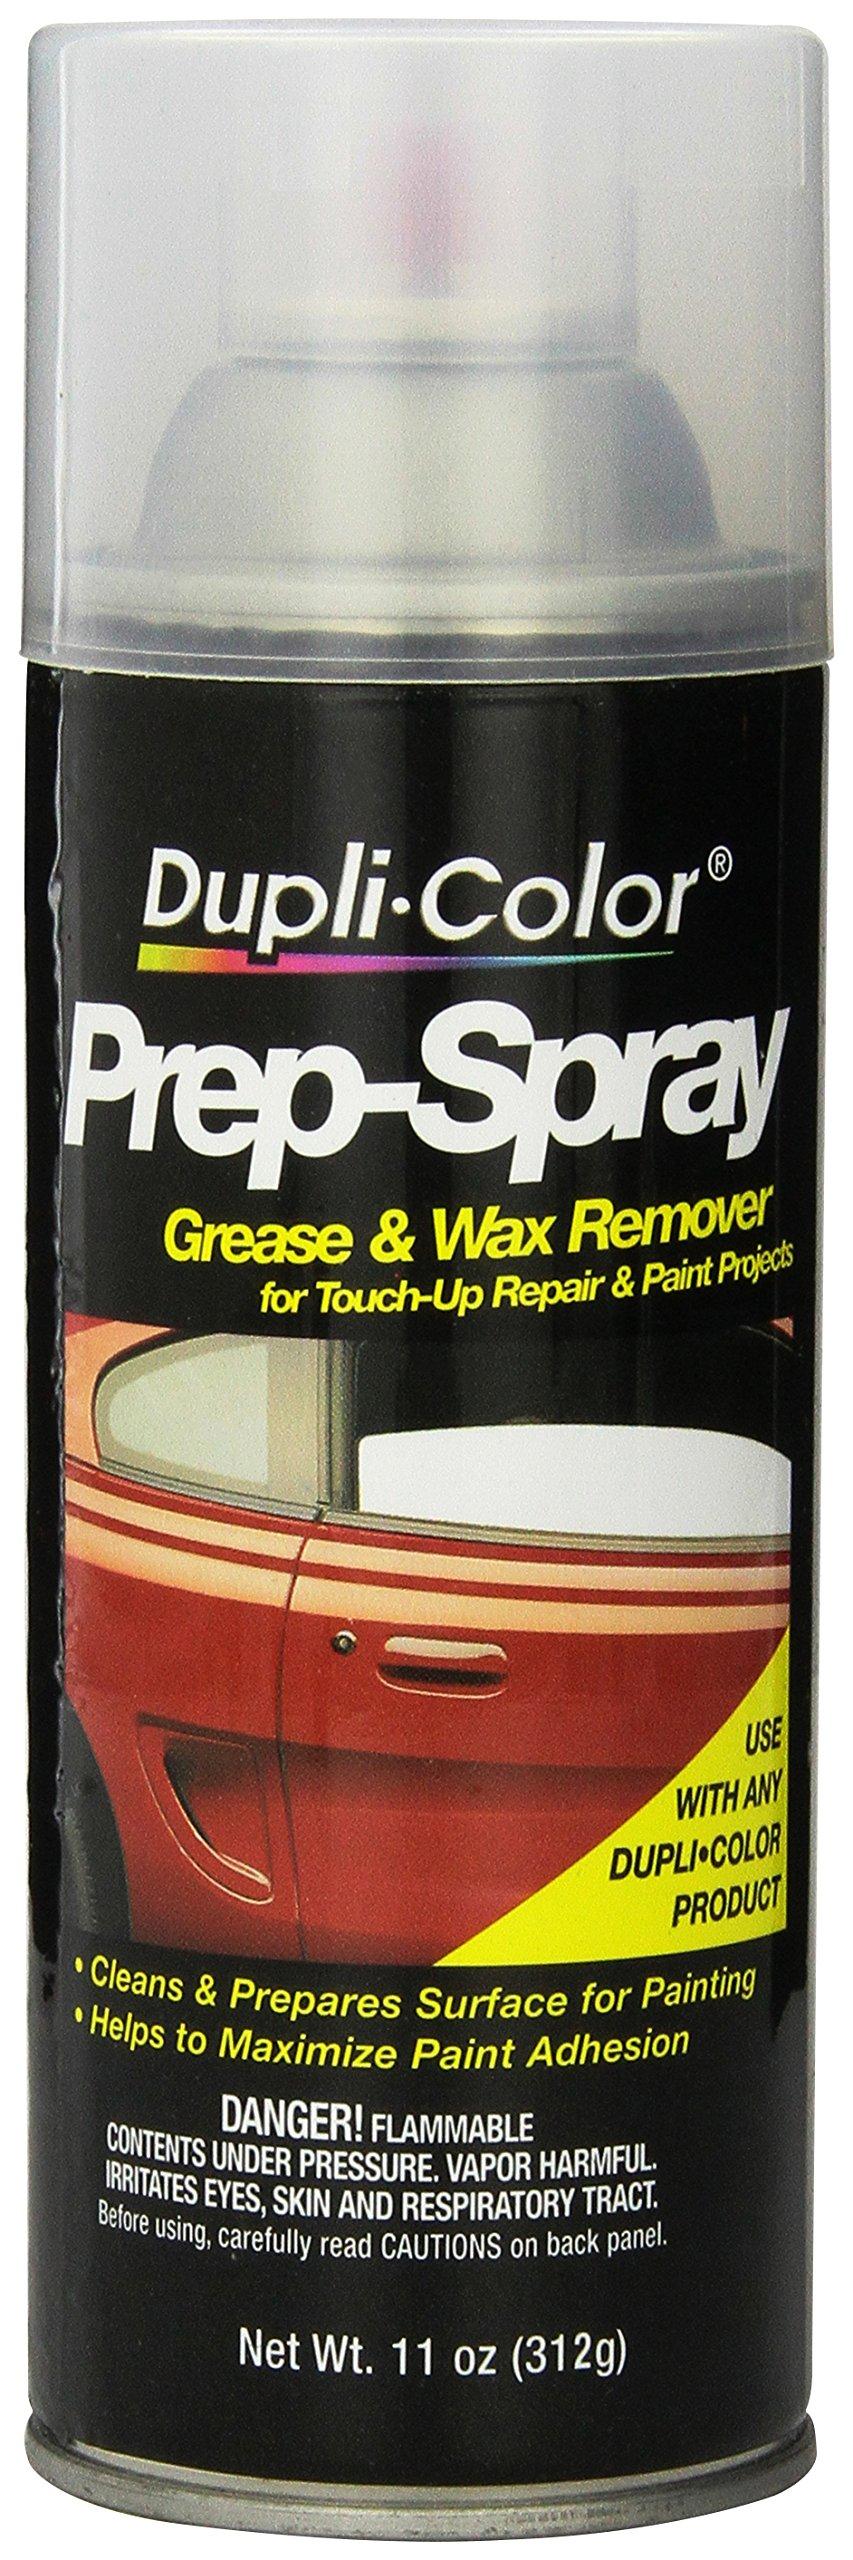 Dupli-Color (PS100-6 PK Grease and Wax Remover - 11 oz. Aerosol, (Case of 6) by Dupli-Color